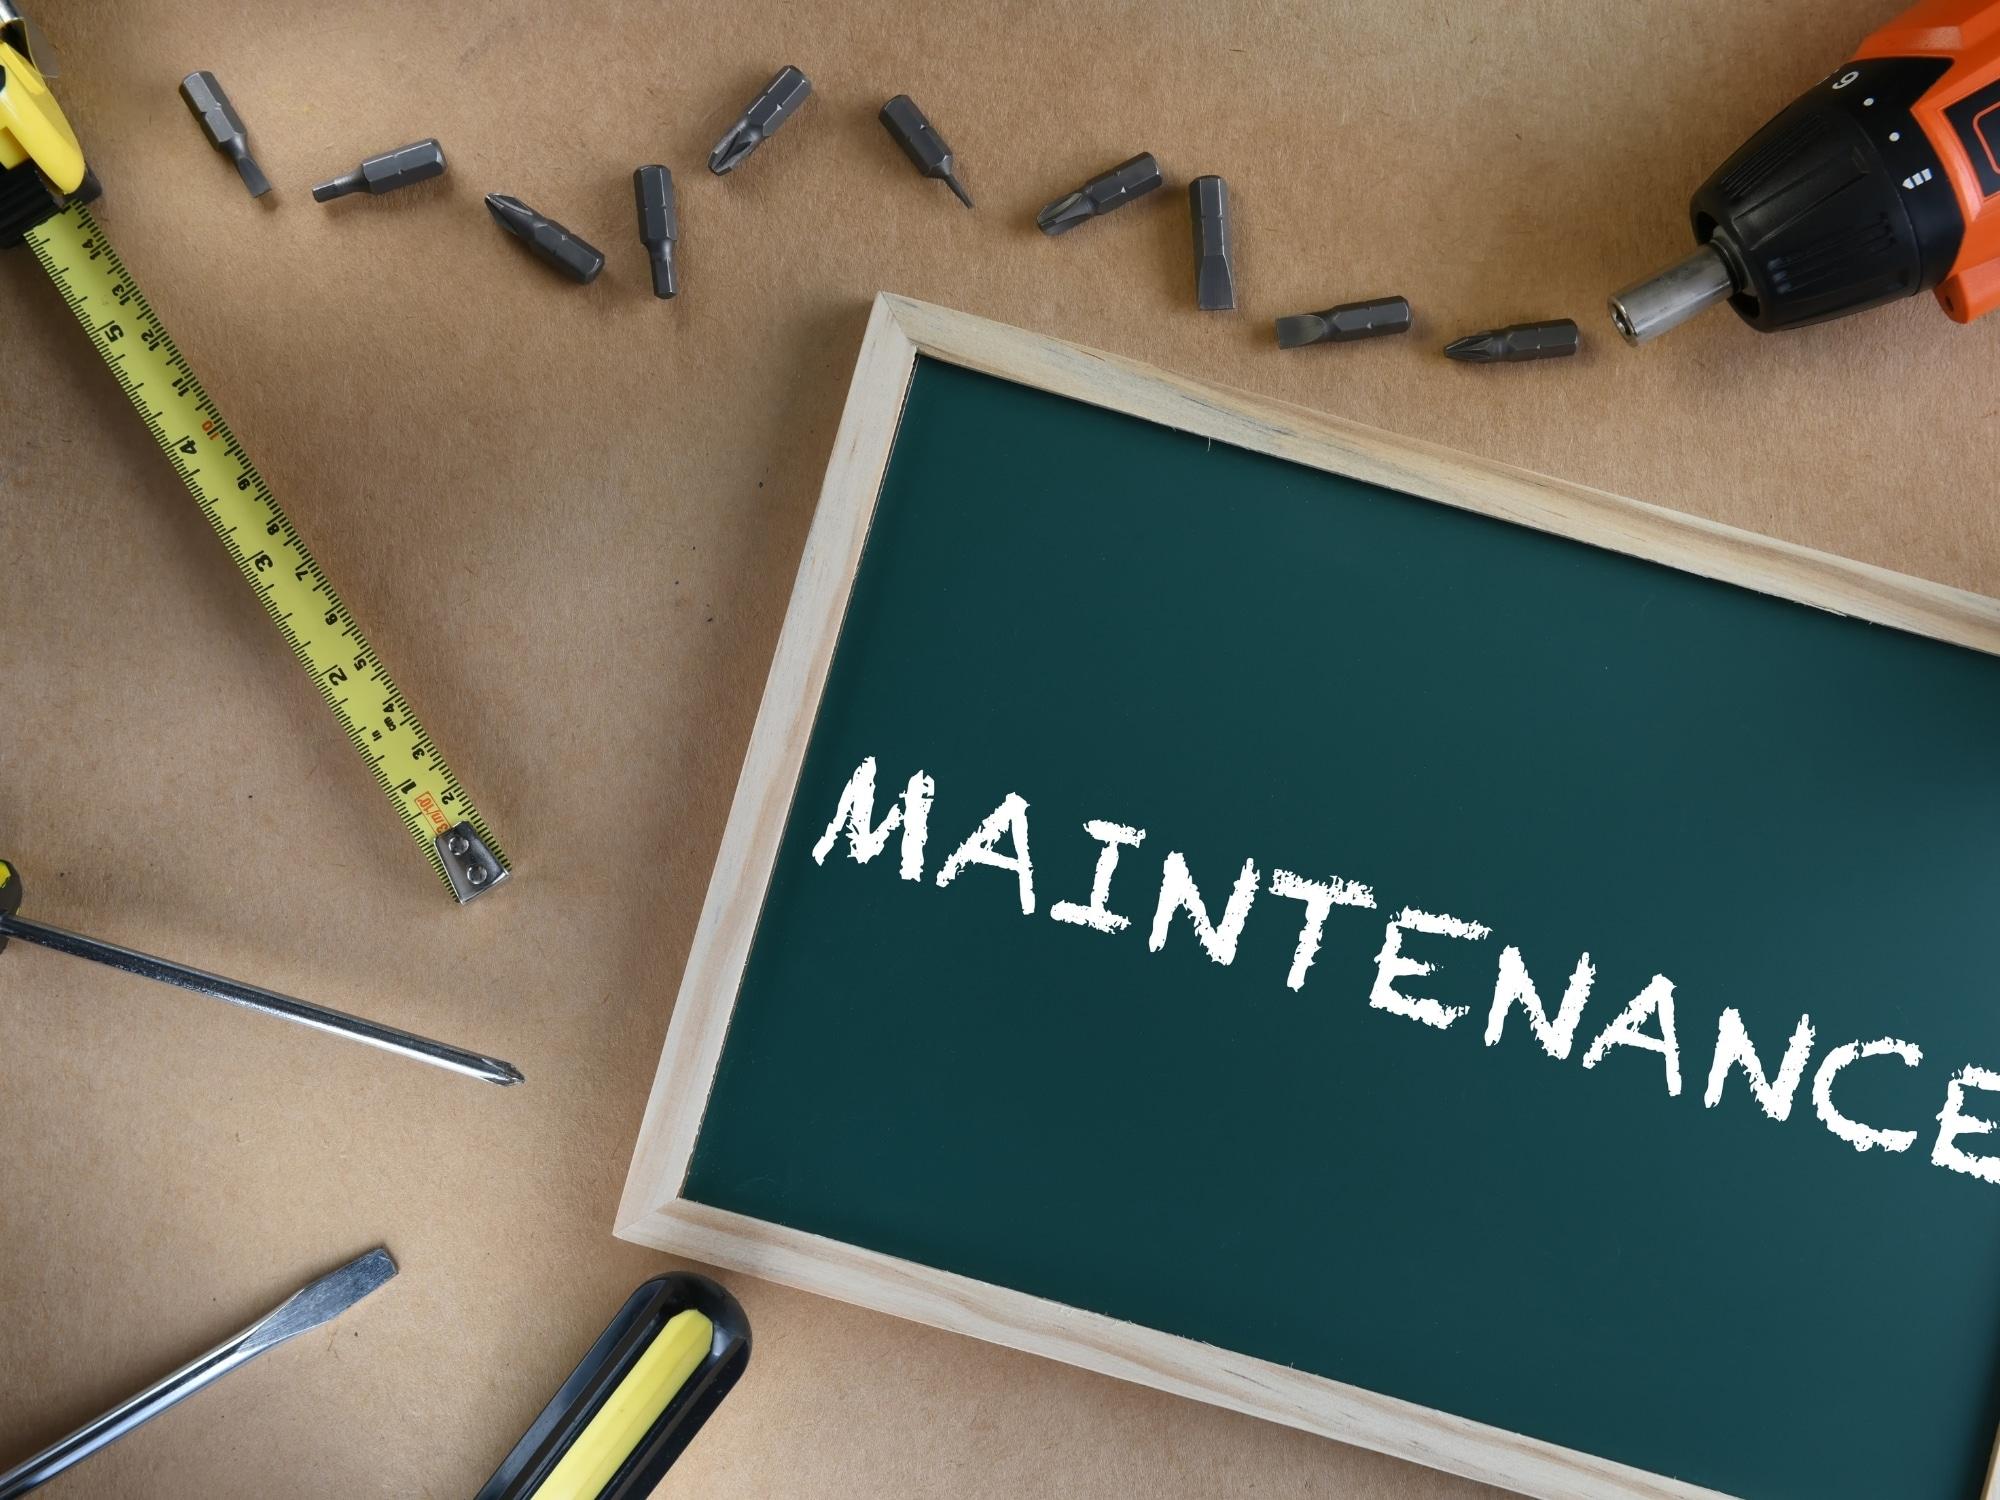 maintanence services dc